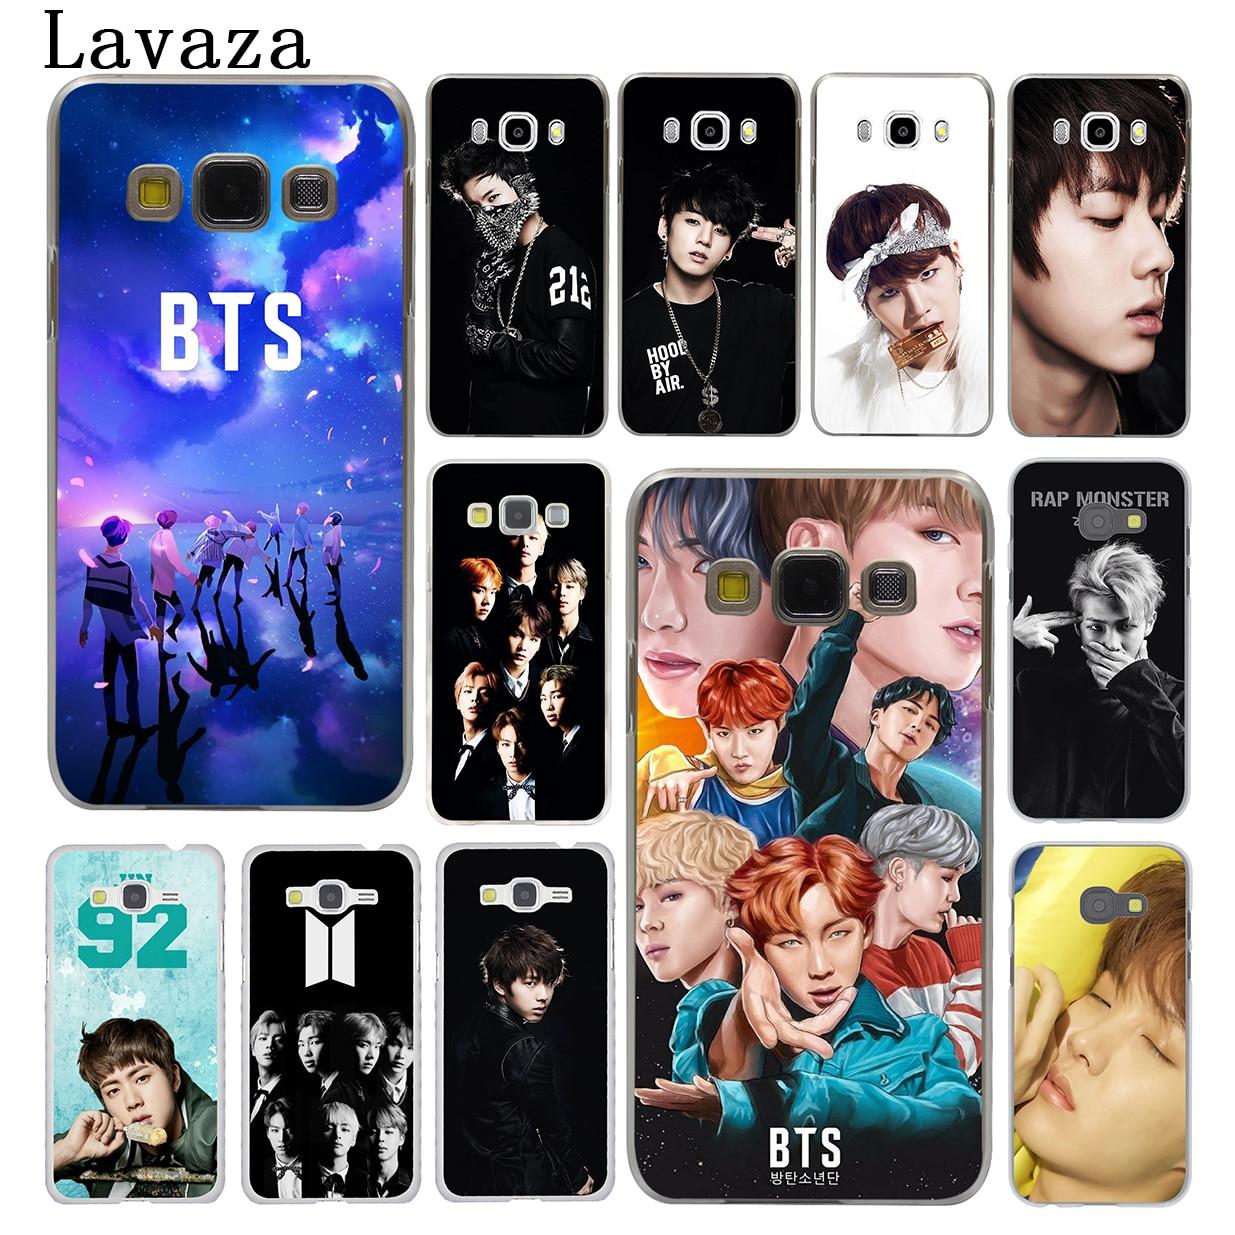 Lavaza BTS Bangtan Boys Jimin ARMY Hard Phone Case for Samsung Galaxy J7 J1 J2 J3 J5 2015 2016 2017 Prime Pro Ace 2018 Cover